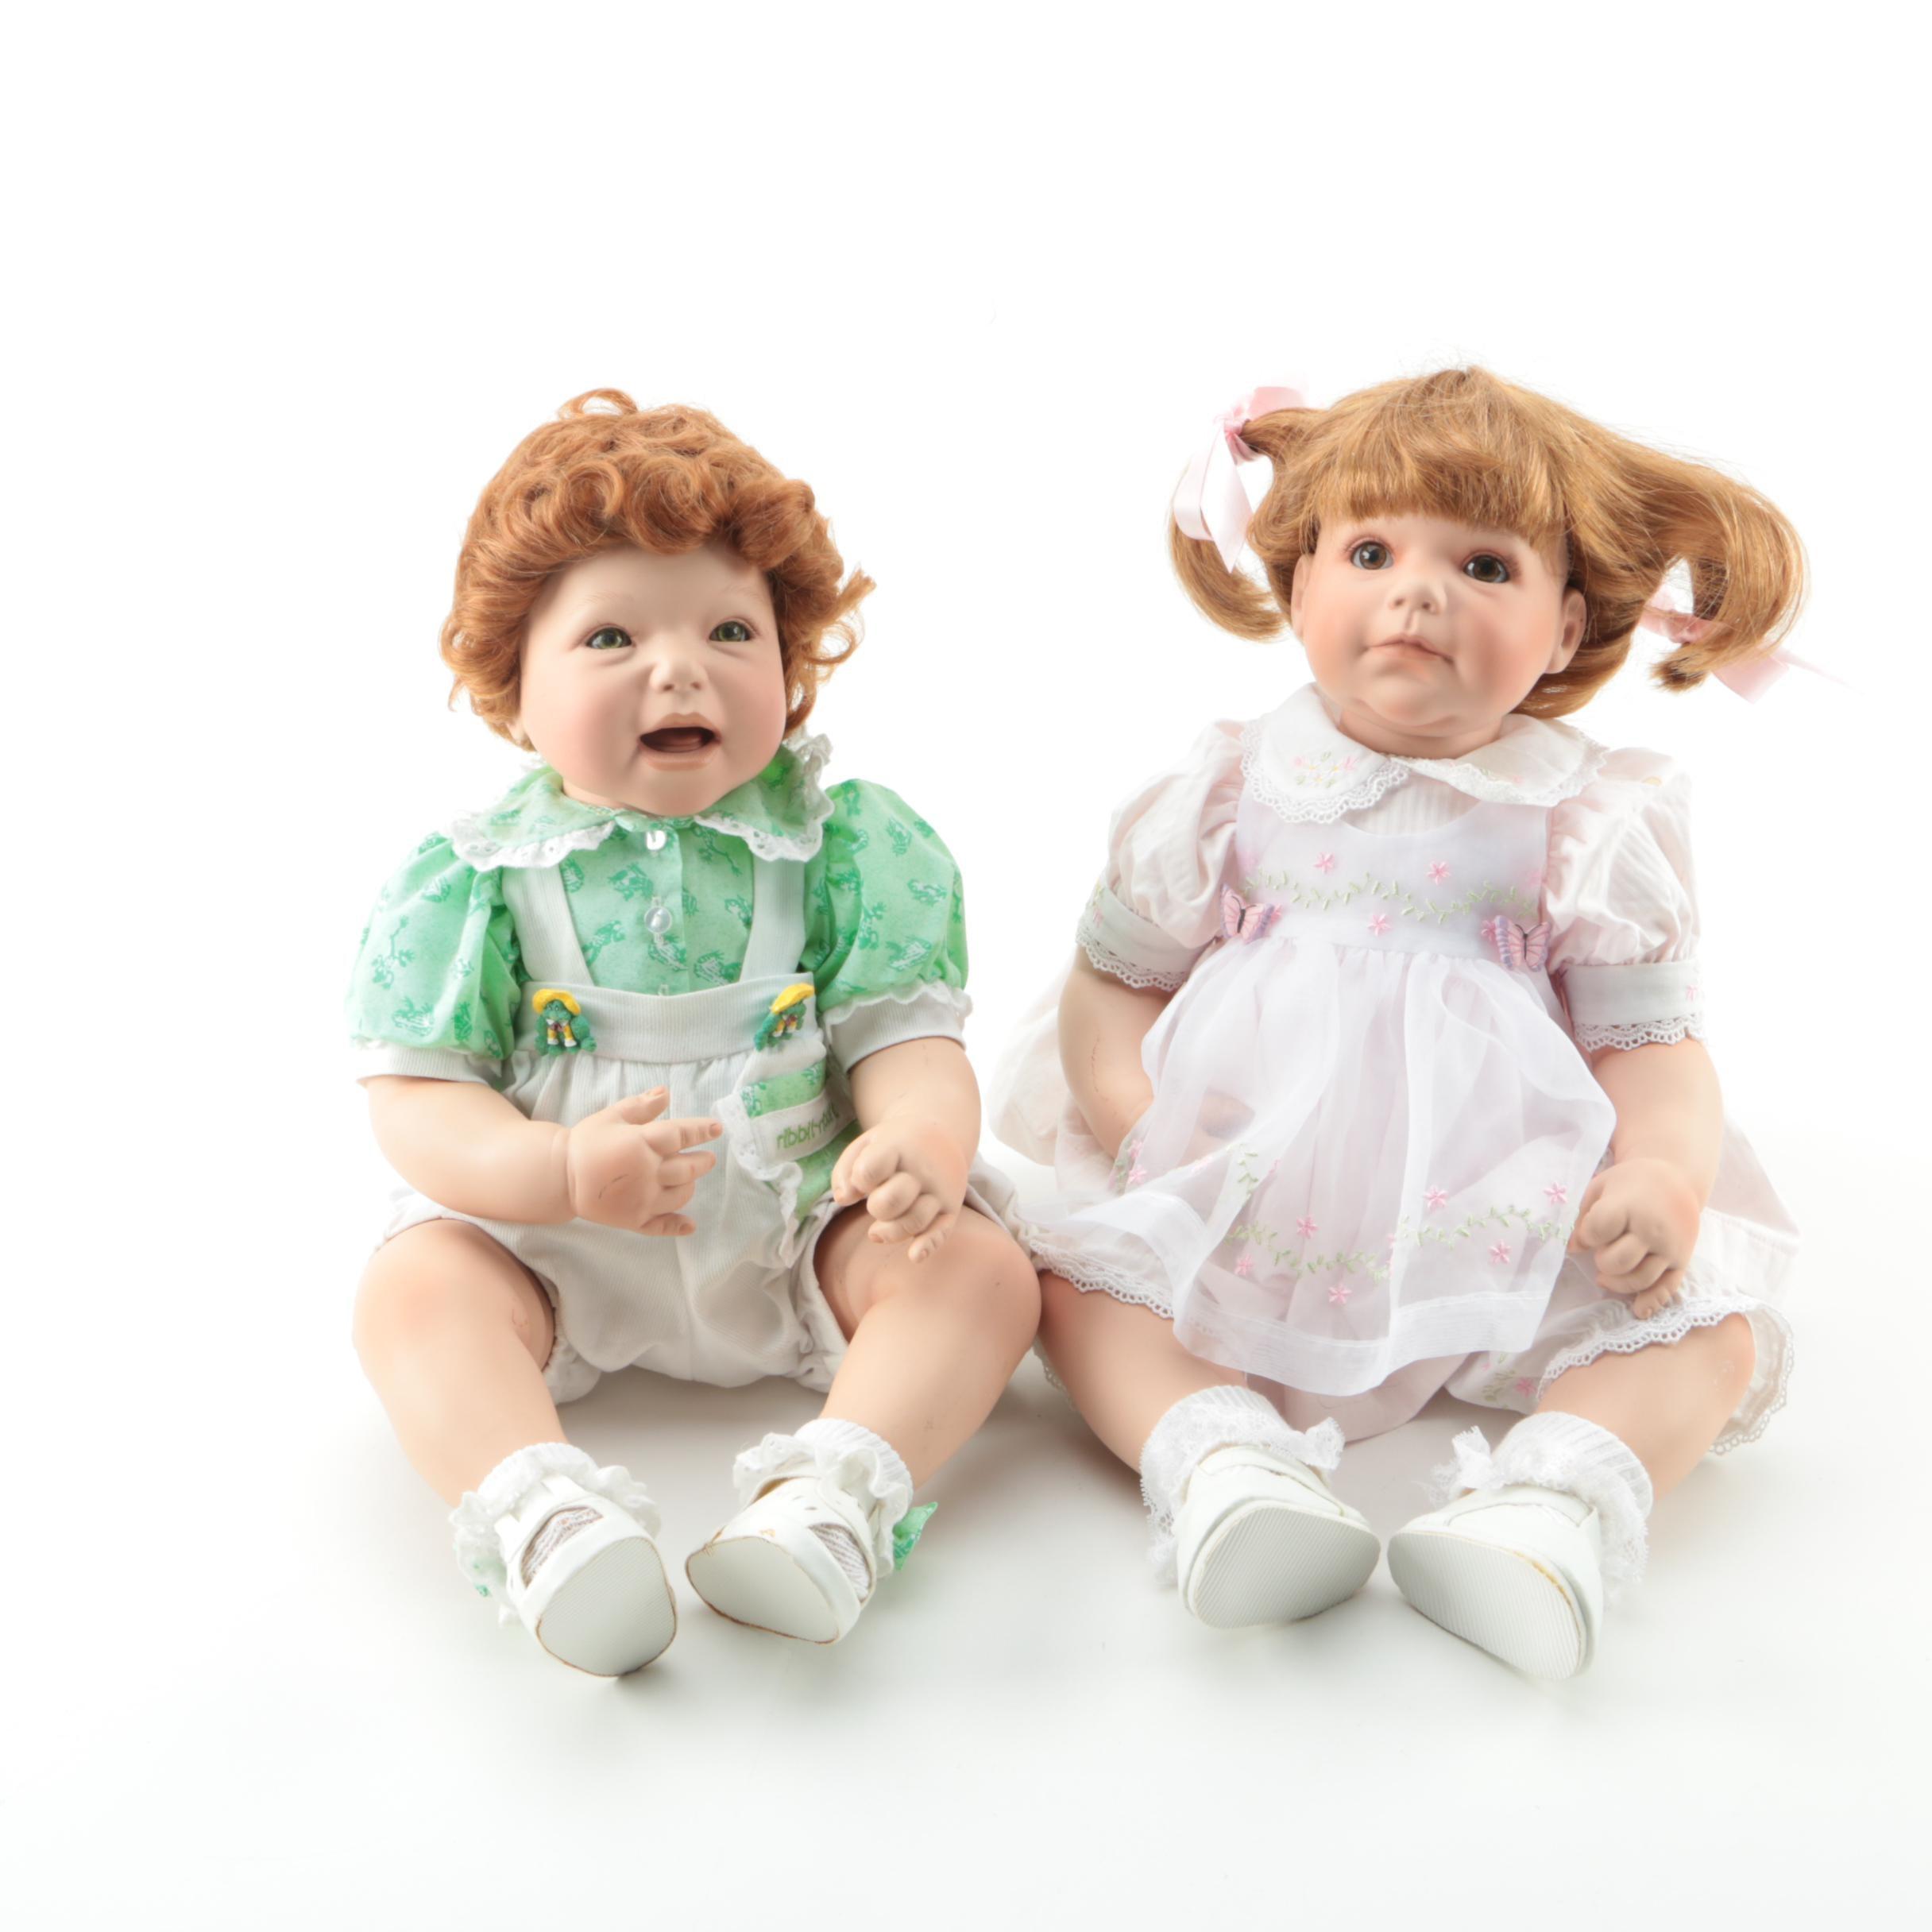 Danbury Mint Seated Porcelain Toddler Dolls